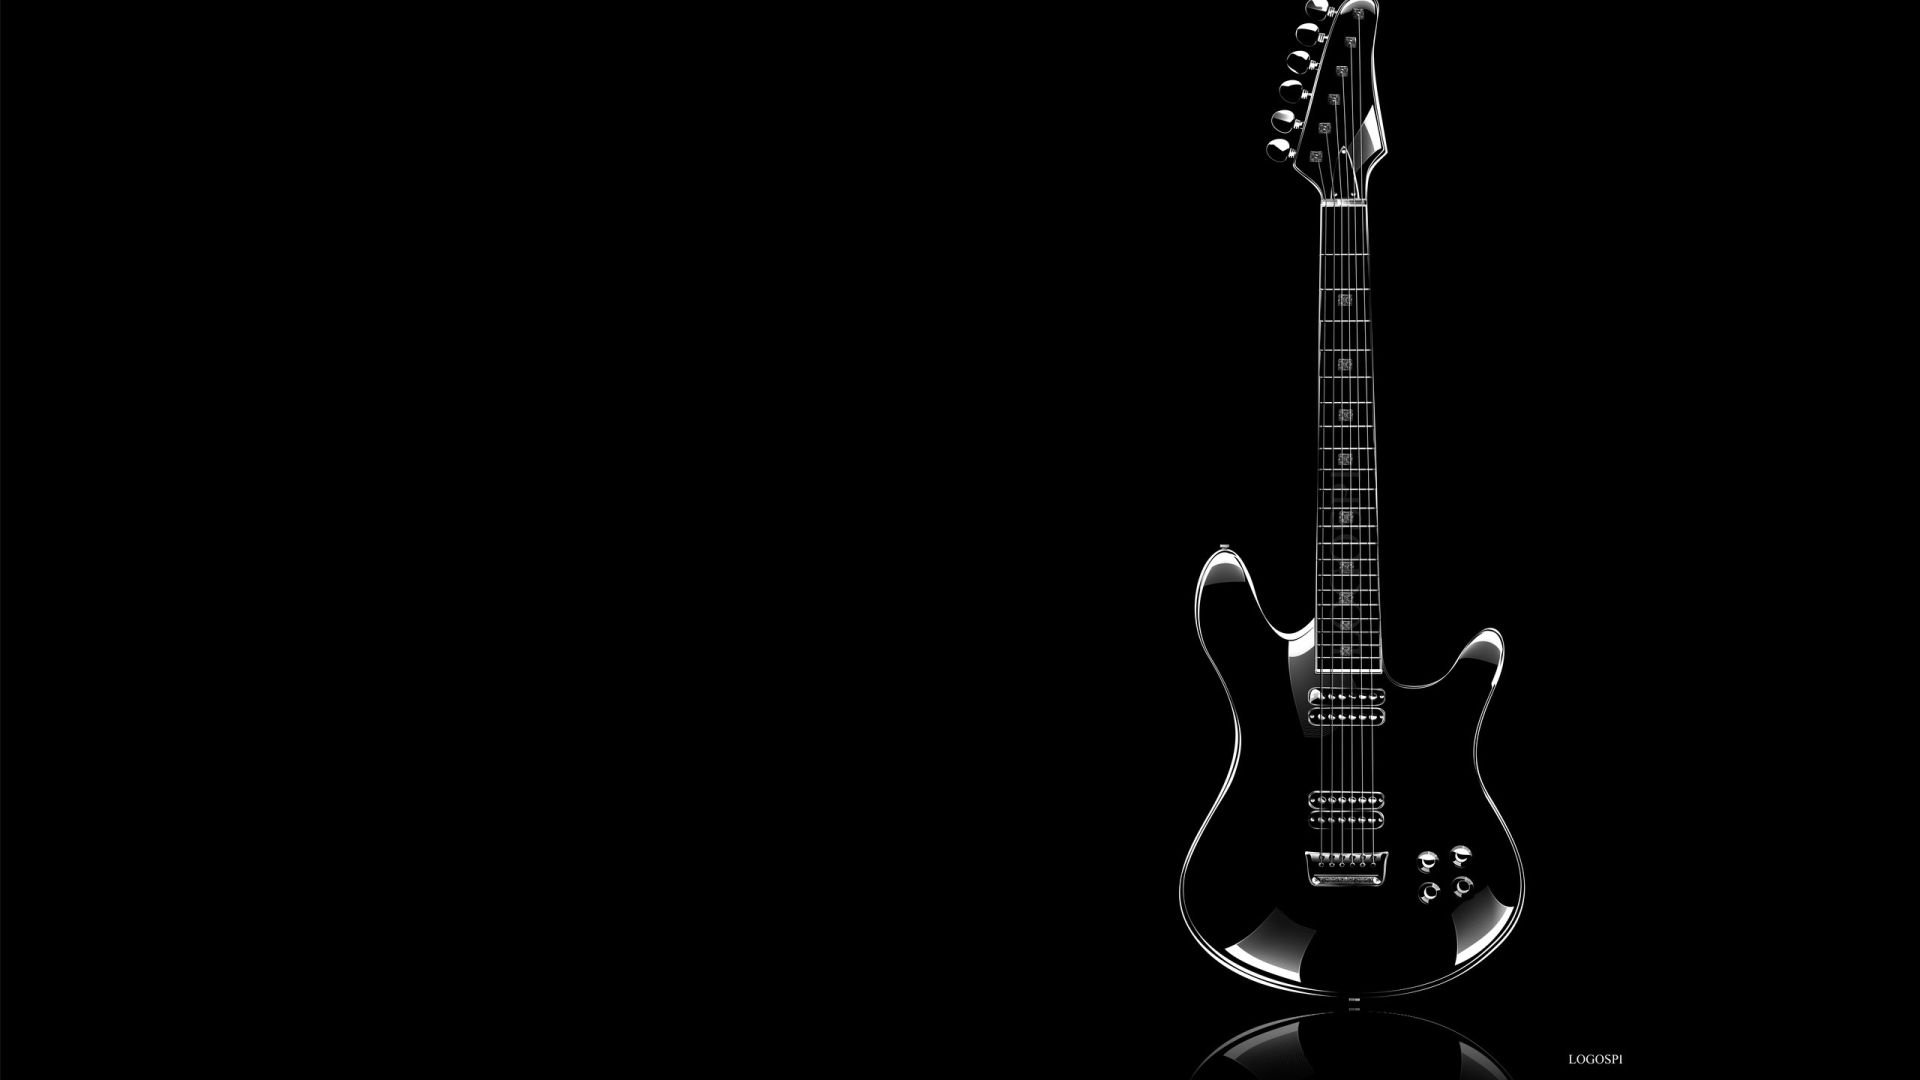 75 Electric Guitar Hd Wallpapers Wallpaperboat